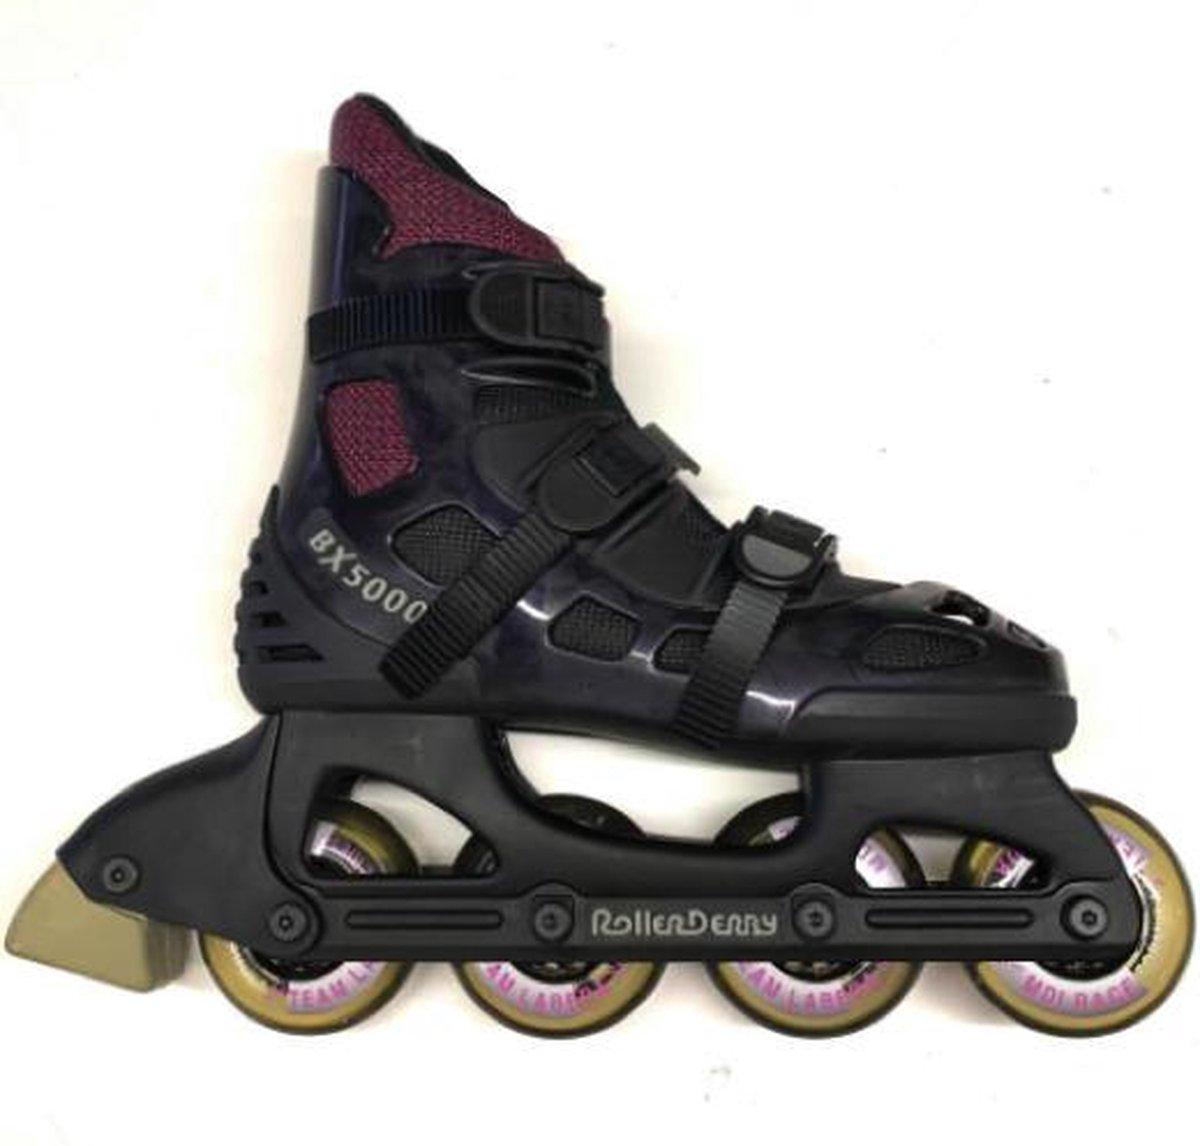 ROLLER DERBY BX5000 Inline Skates Heren - Maat US 6